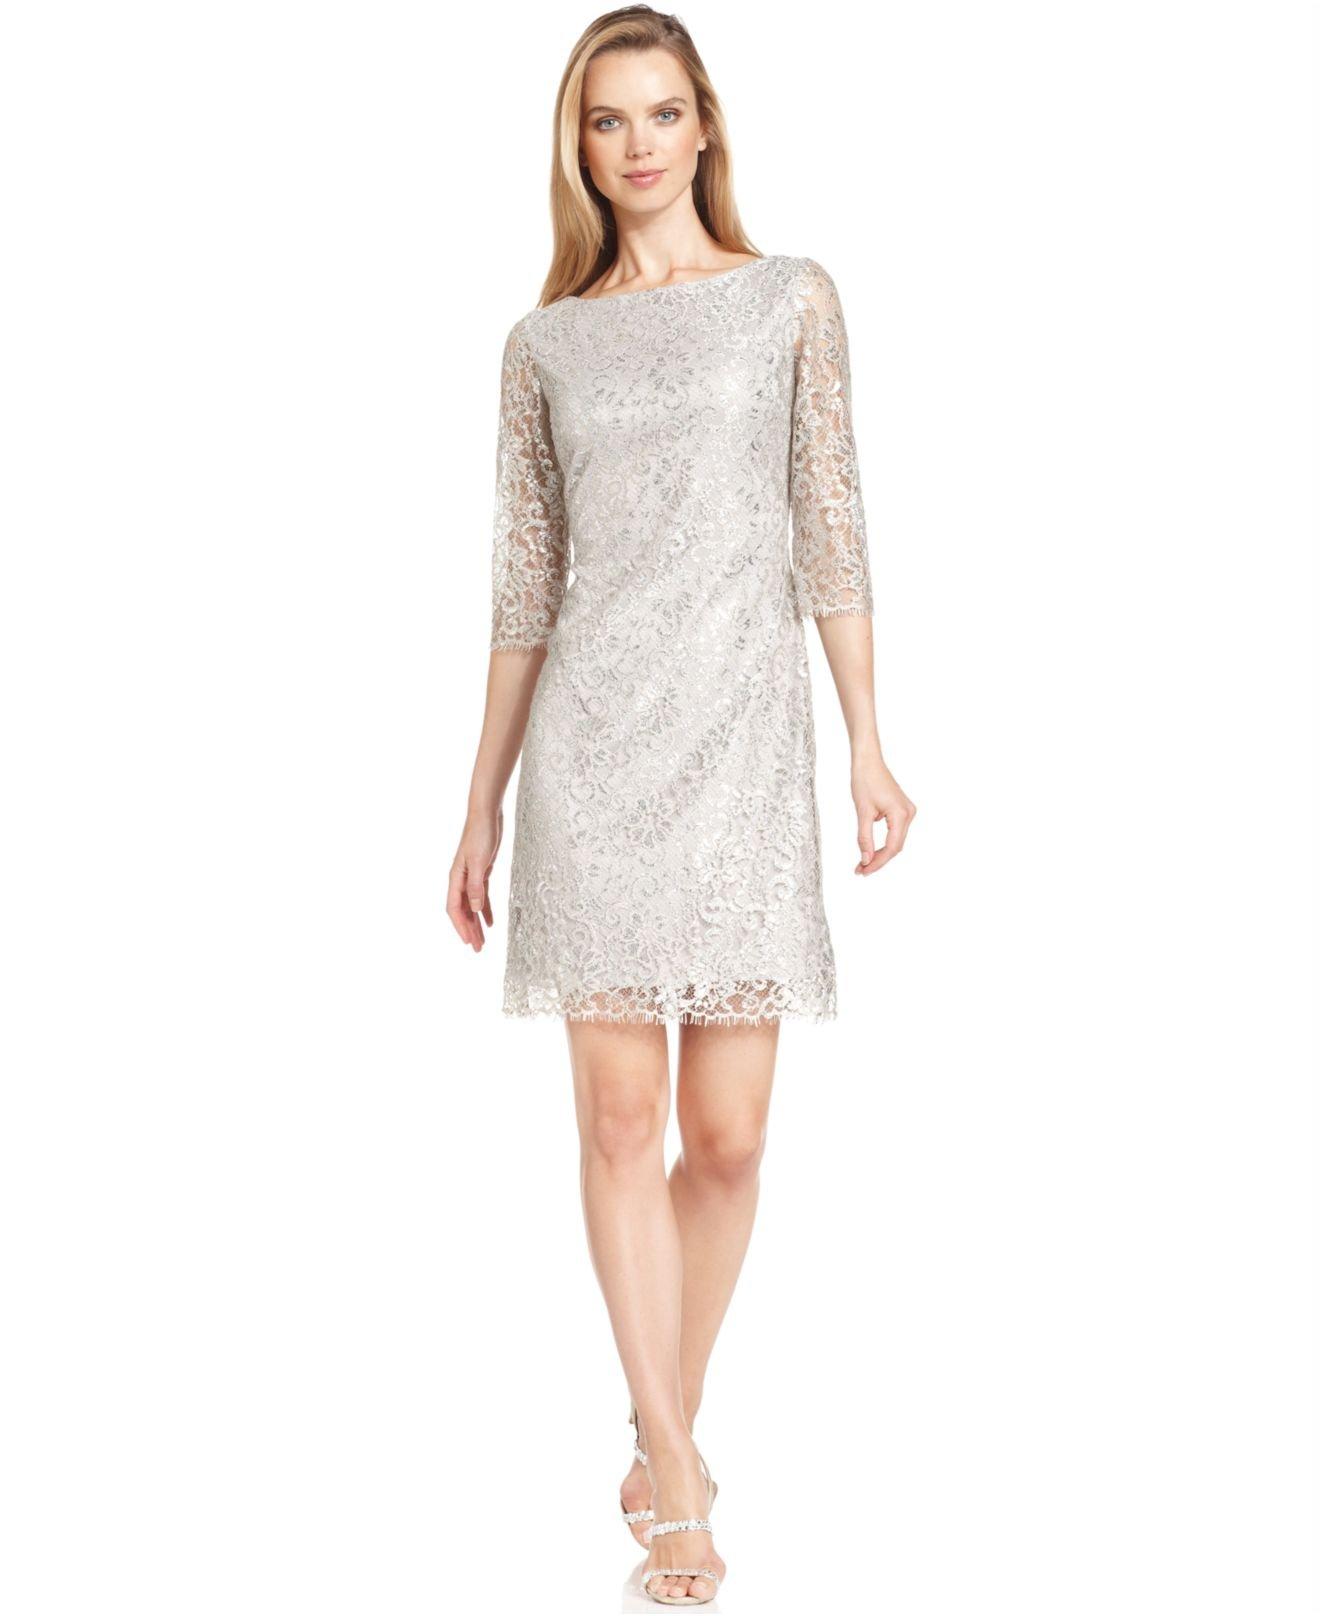 lyst calvin klein petite three quarter sleeve metallic lace dress in natural. Black Bedroom Furniture Sets. Home Design Ideas